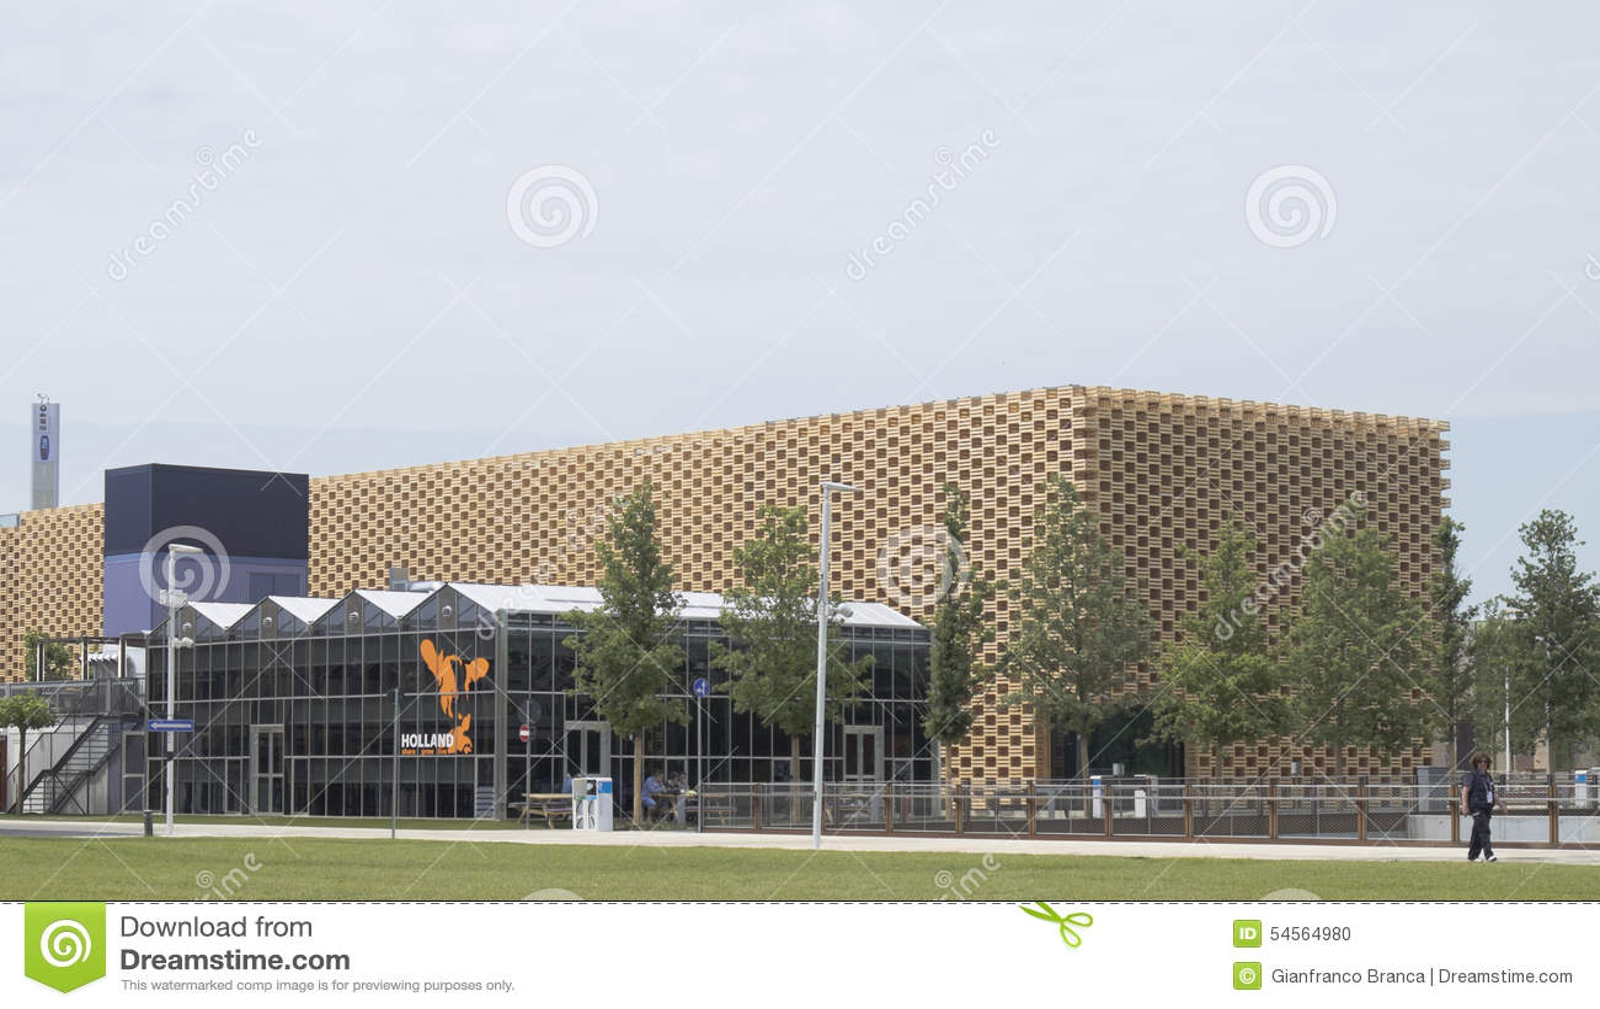 Expo Milan Nederland Pavilion 2015